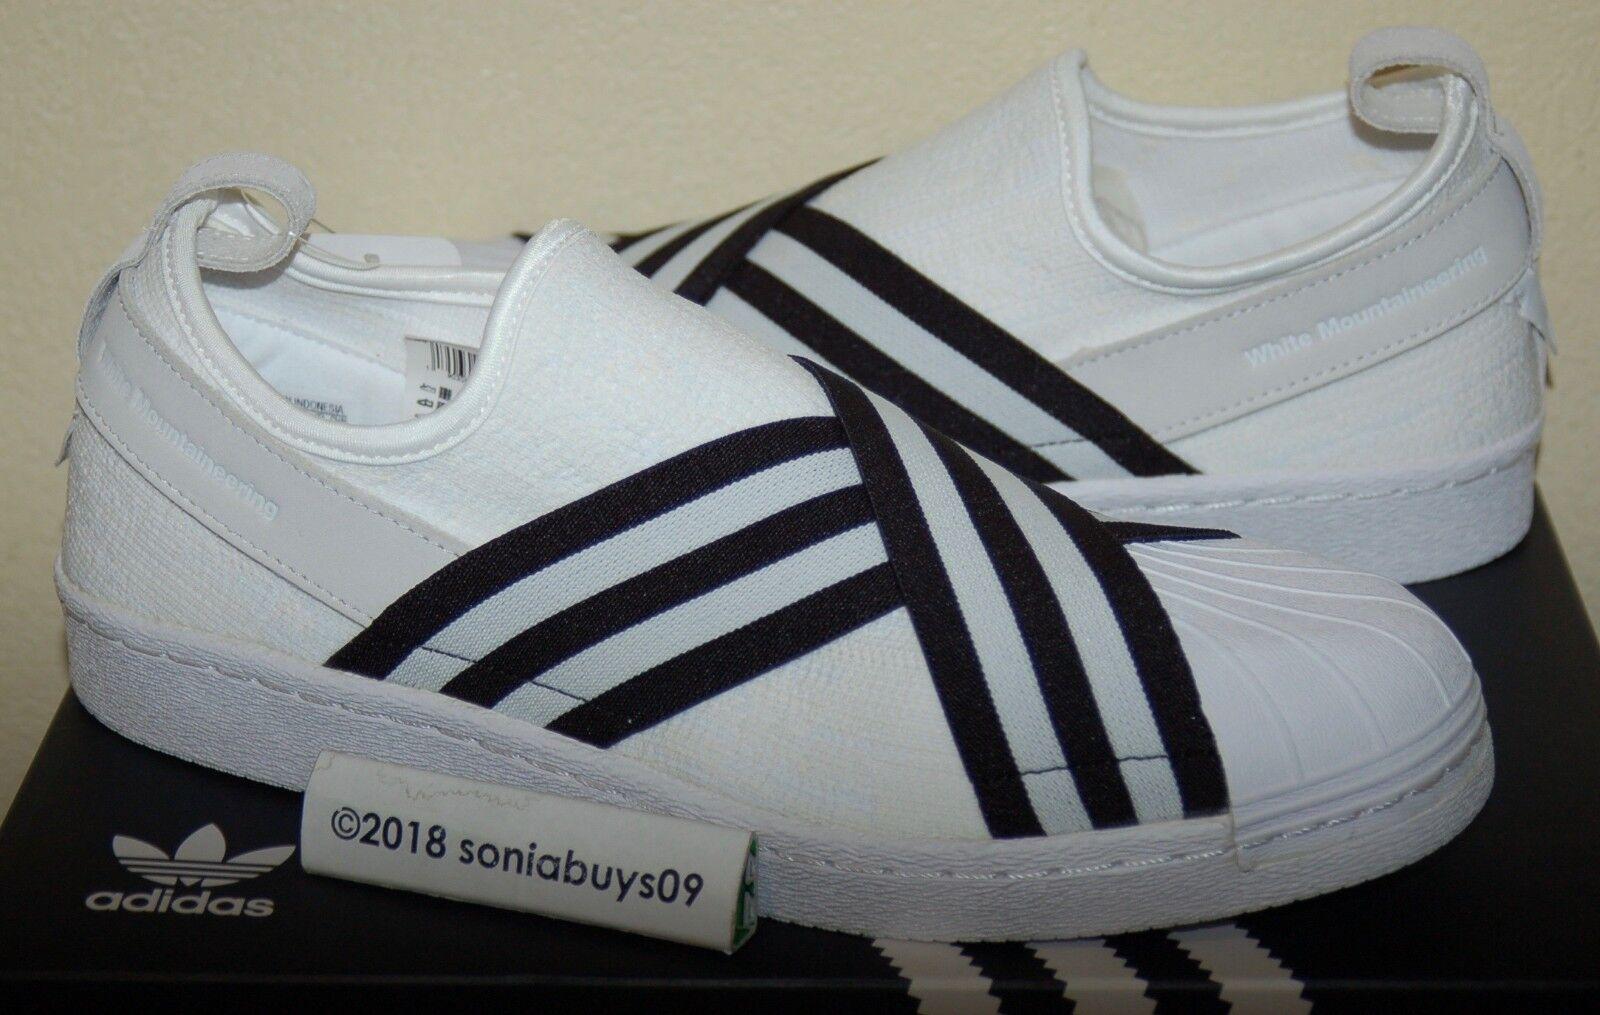 Adidas superstar x uomini 'alpinismo primeknit superstar Adidas mocassini, by2881, 10,5 b2c443